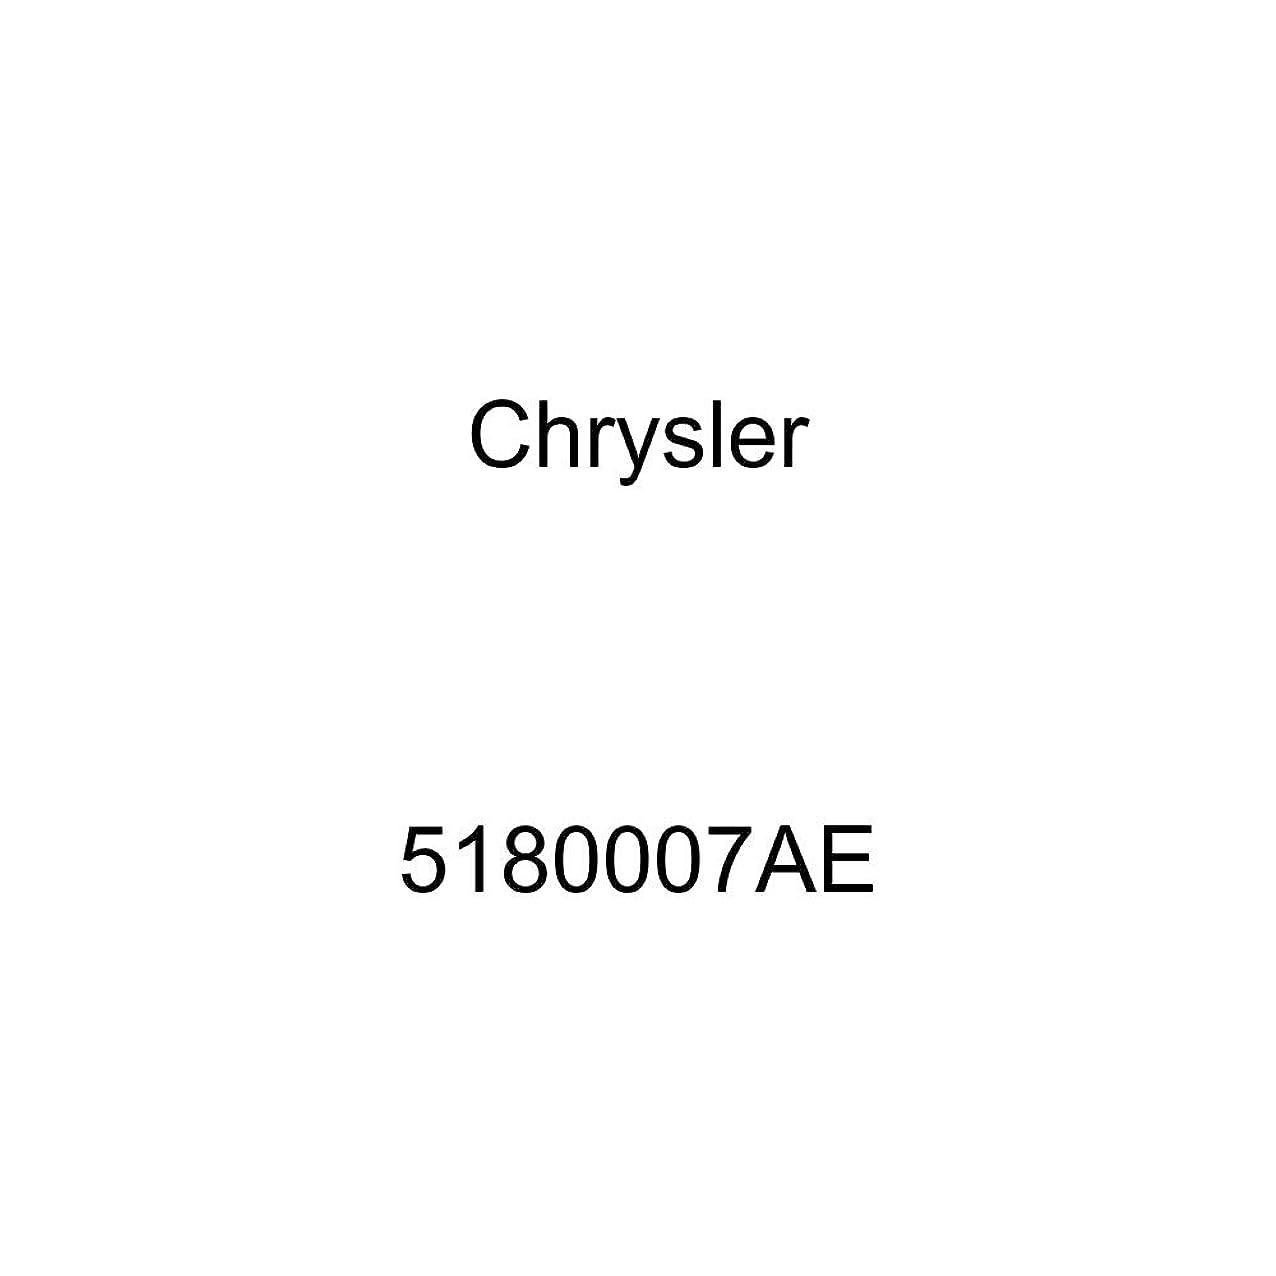 Genuine Chrysler 5180007AE Power Steering Pressure Hose dgoteydoatbkf215